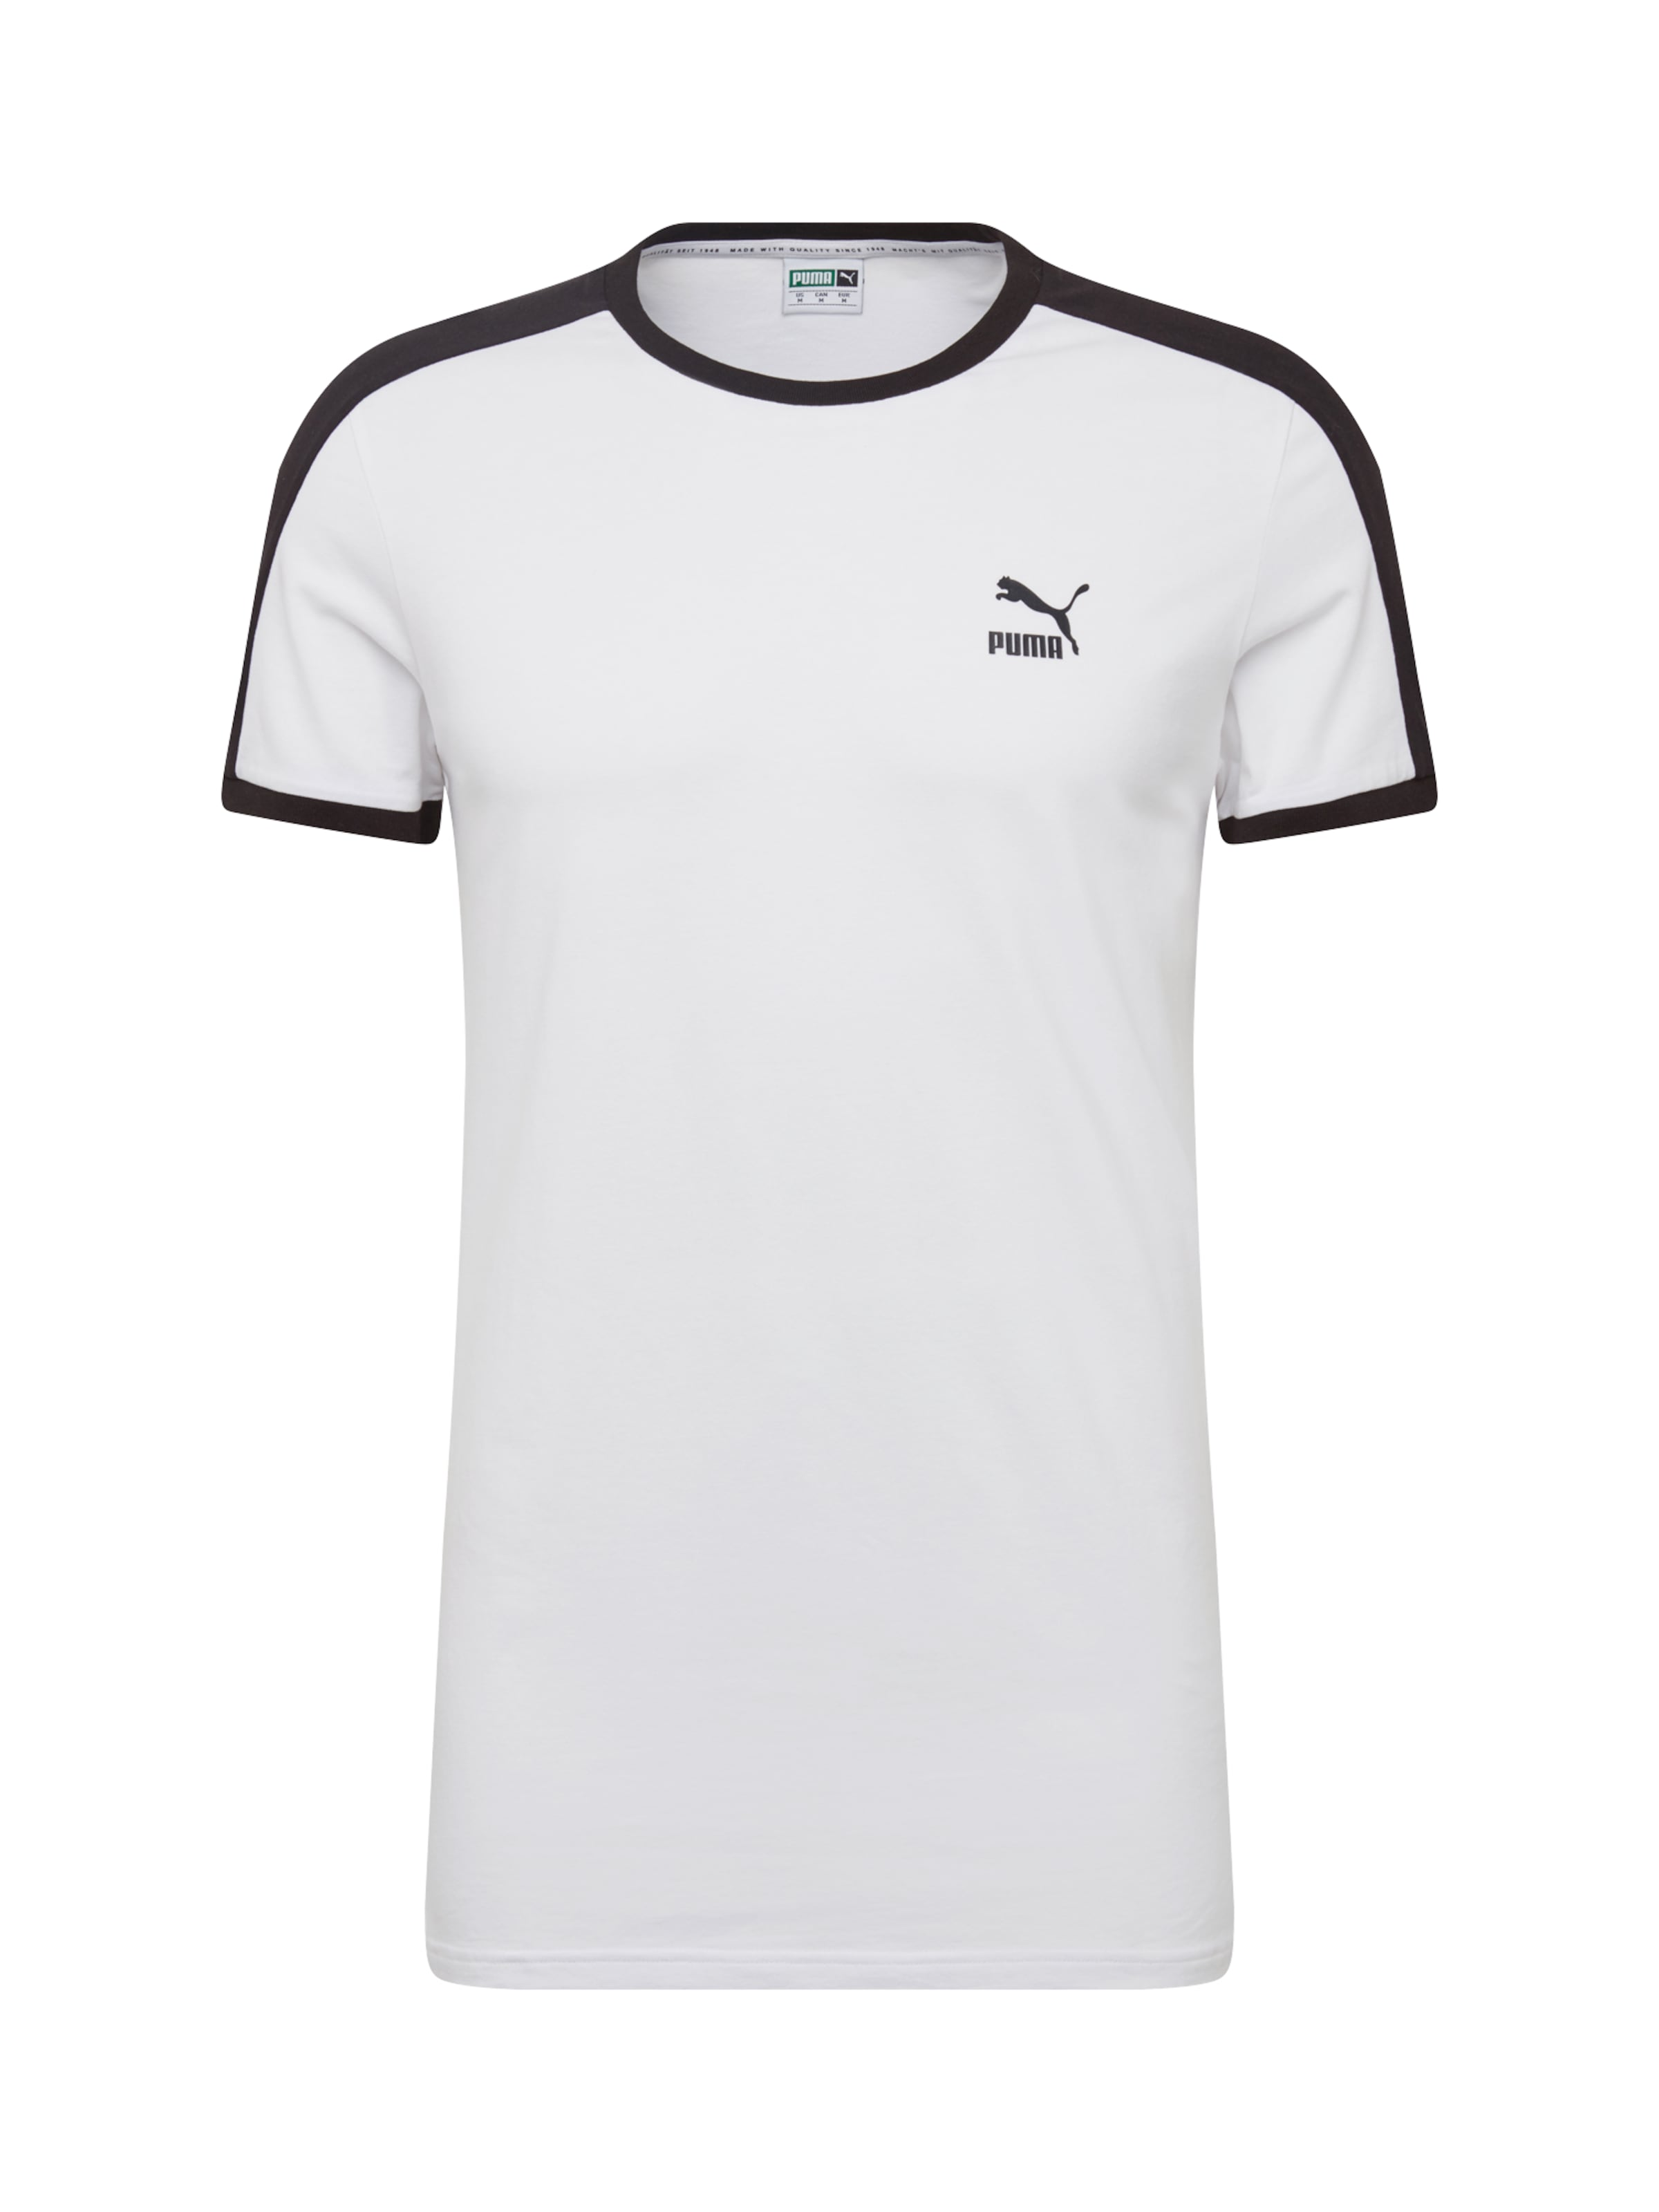 Puma NuitJaune shirt Bleu T T7' 'iconic En LpGSzqUMV